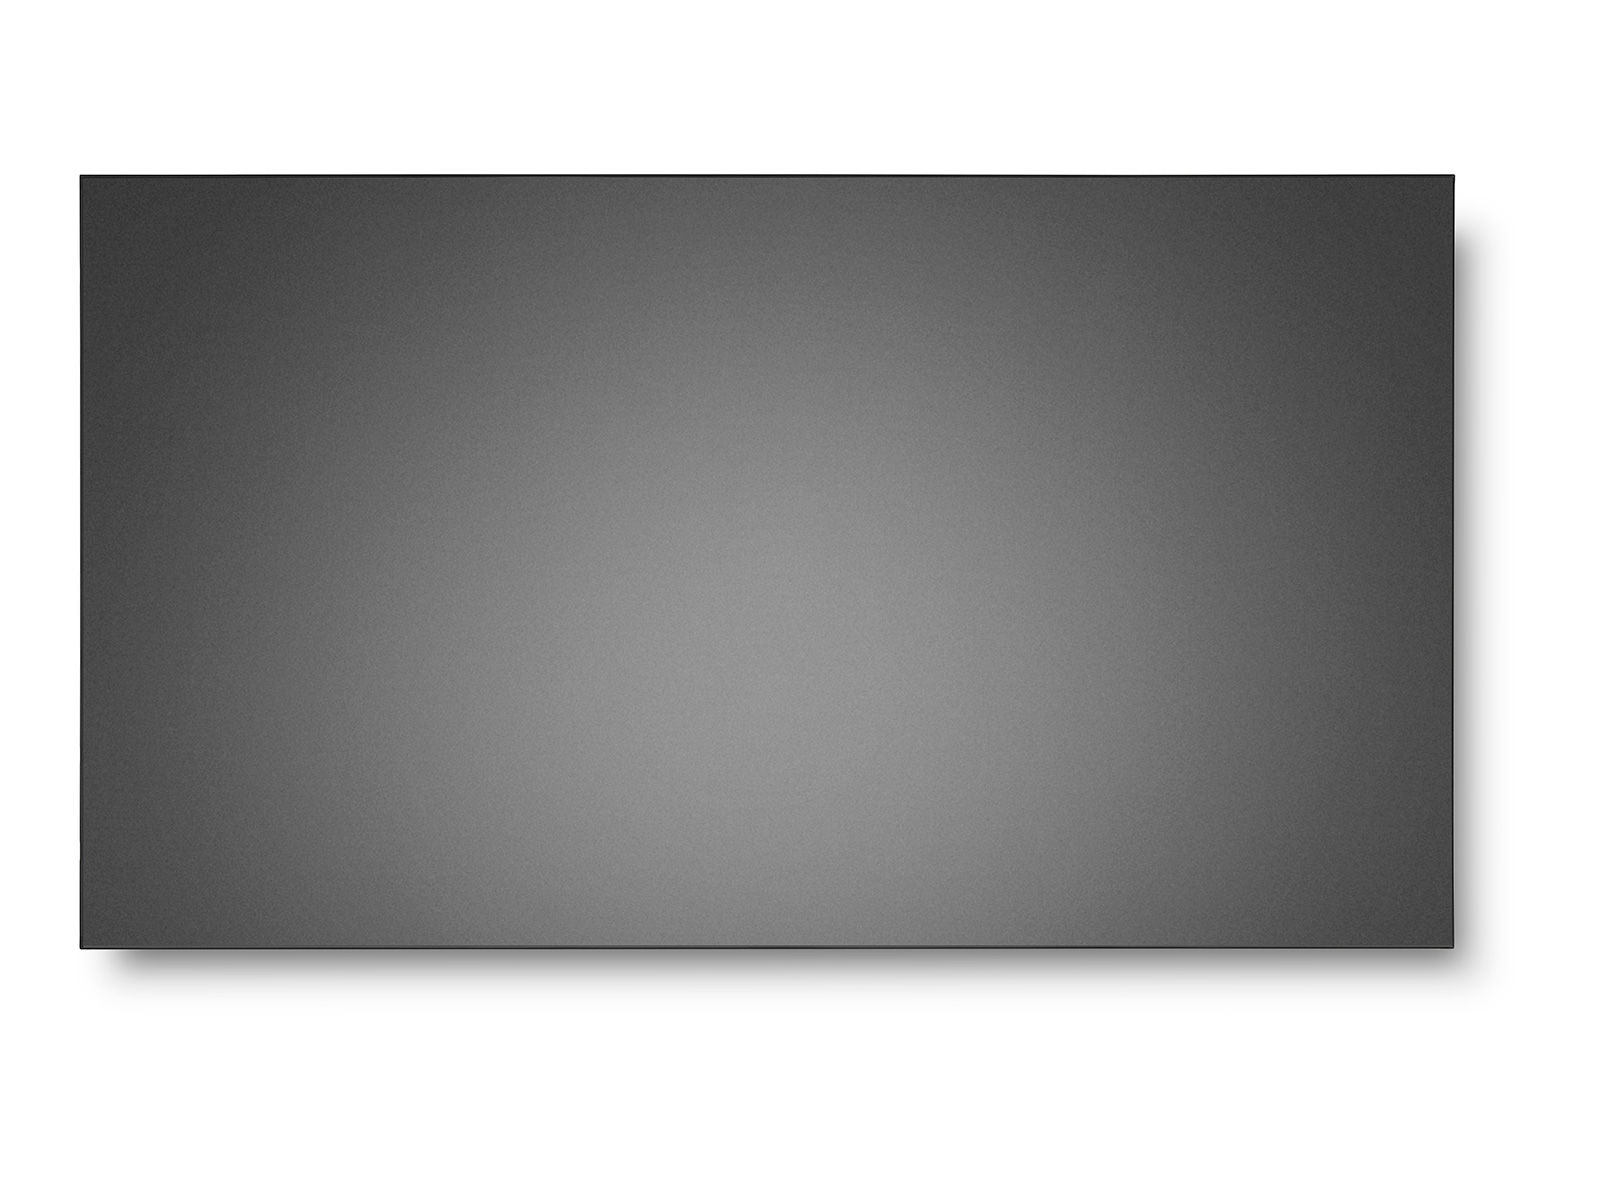 55in UN552V IPS Display For Videowalls